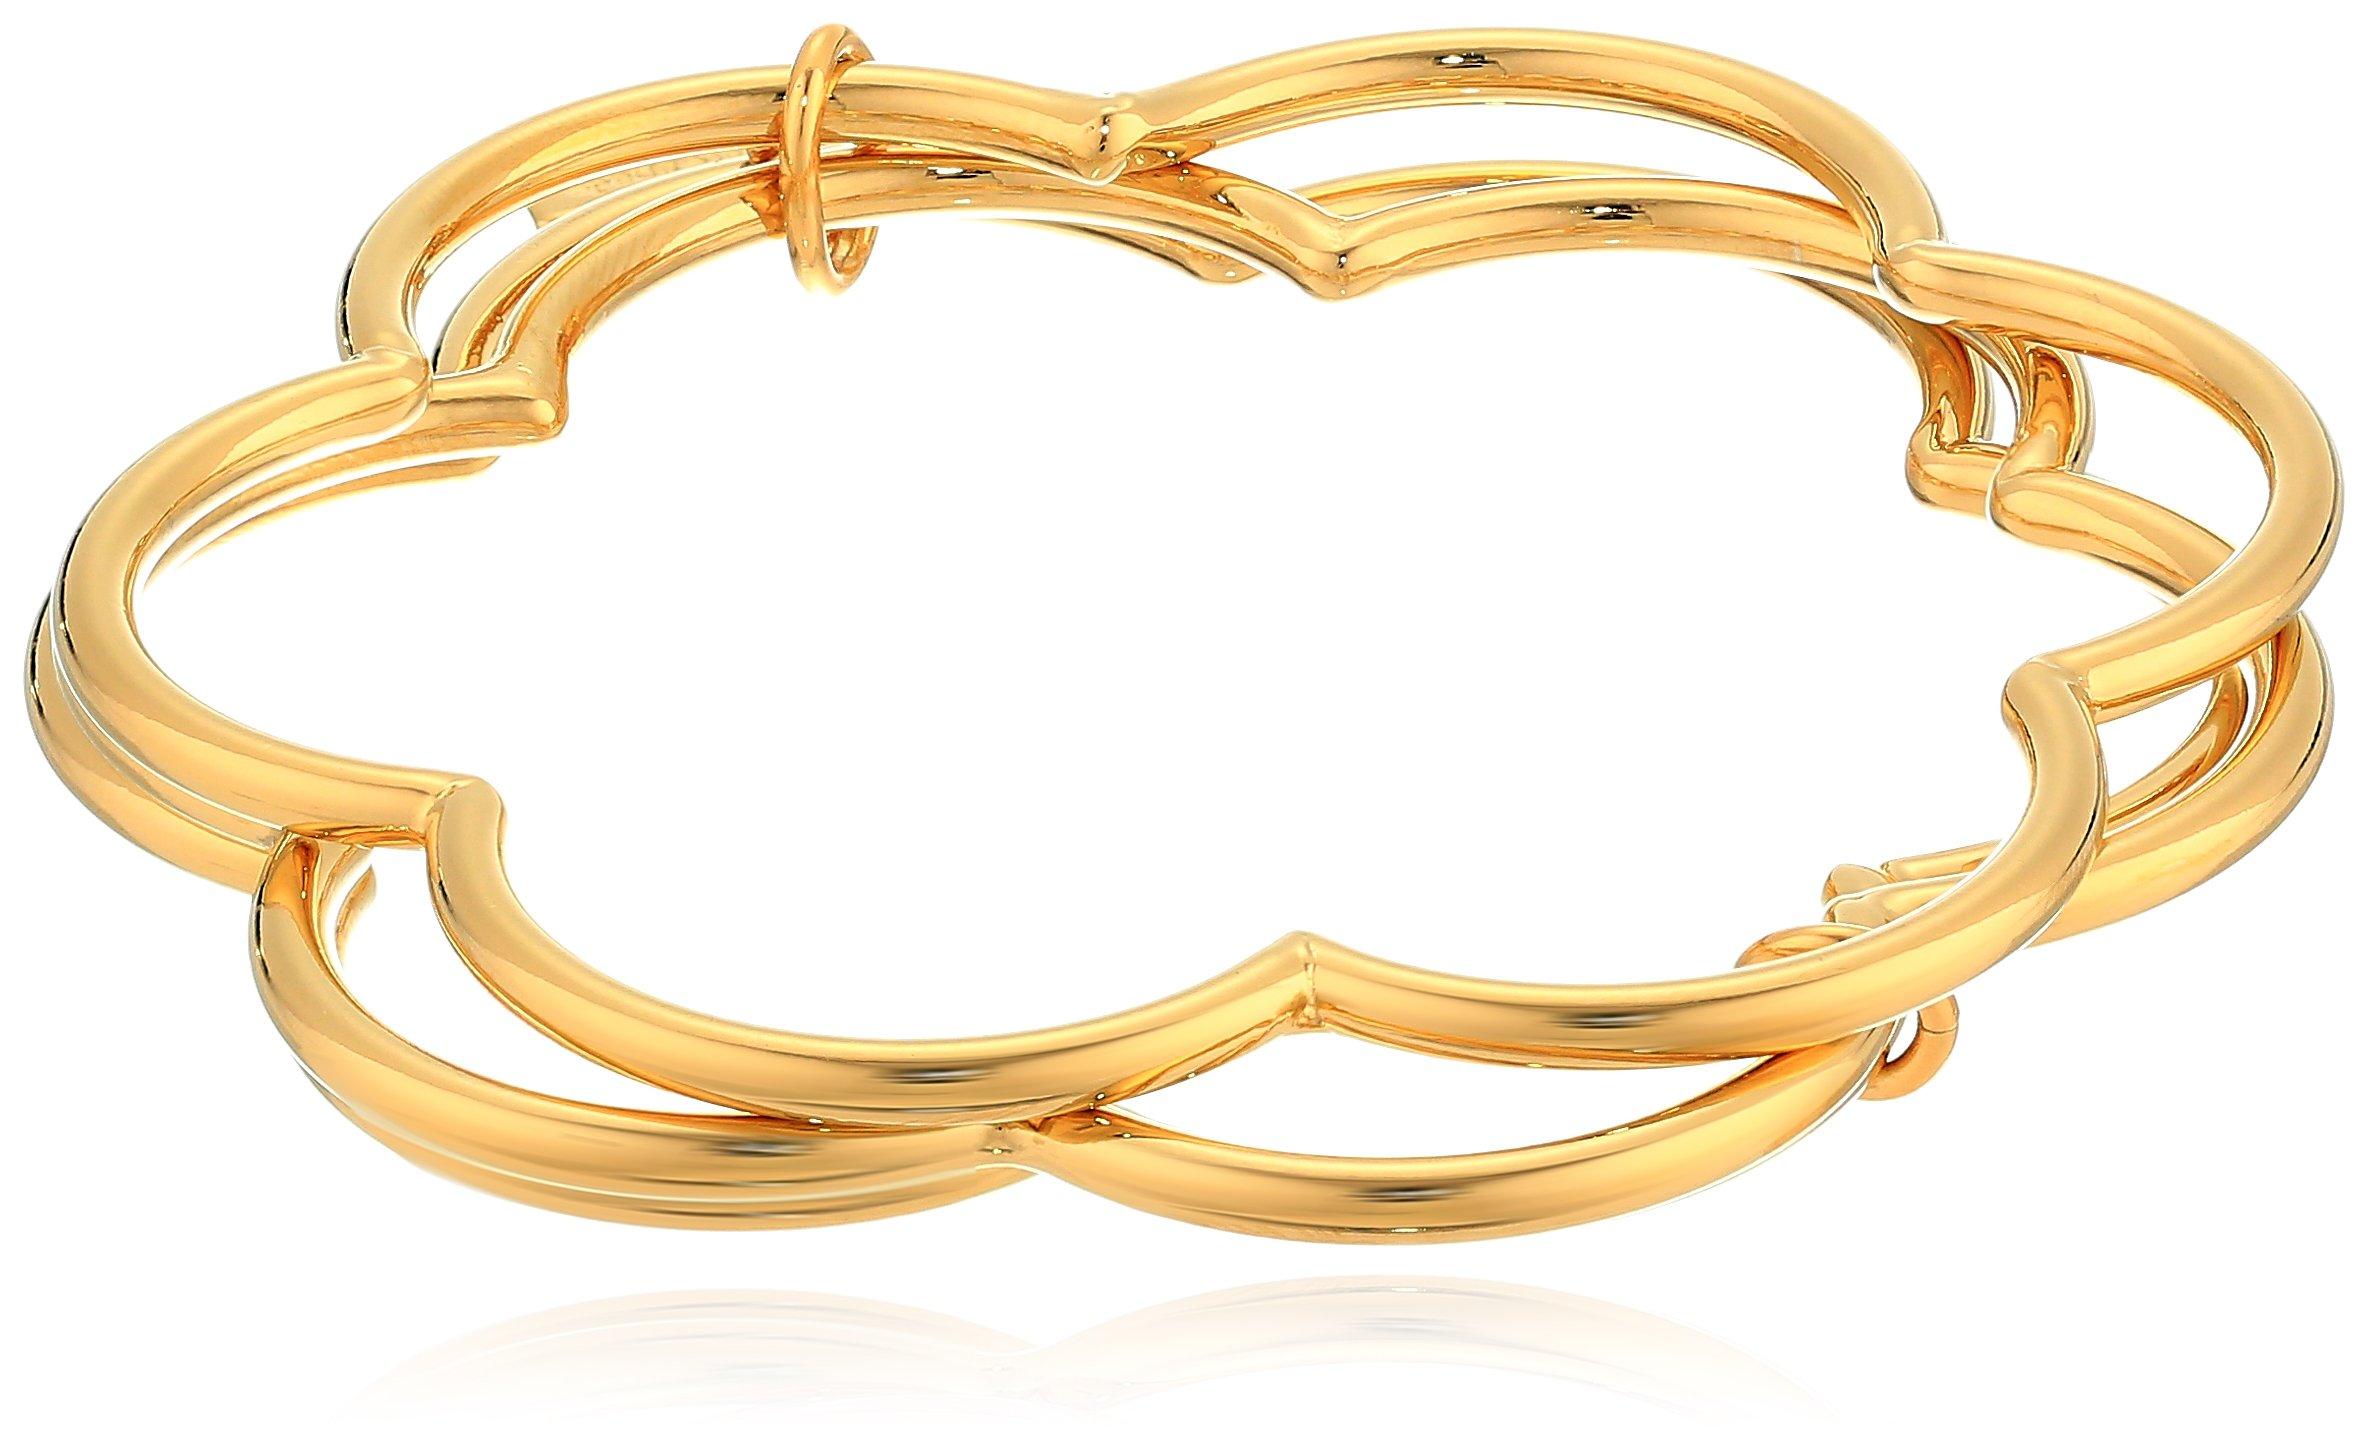 Kate Spade New York Womens Stackable Bangle Bracelet Set, Gold